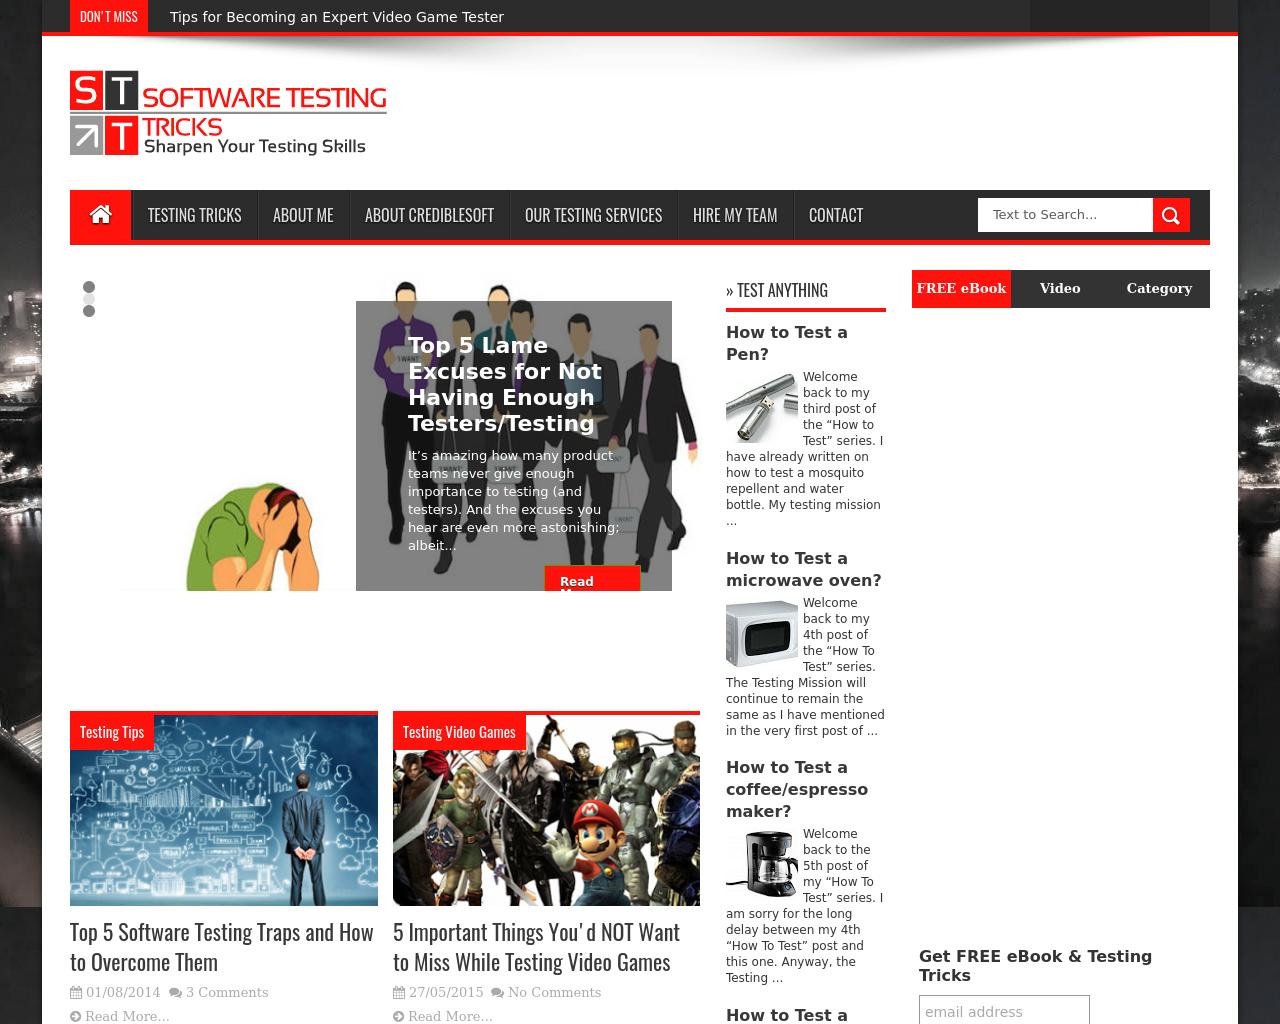 Software-Testing-Tricks-Advertising-Reviews-Pricing